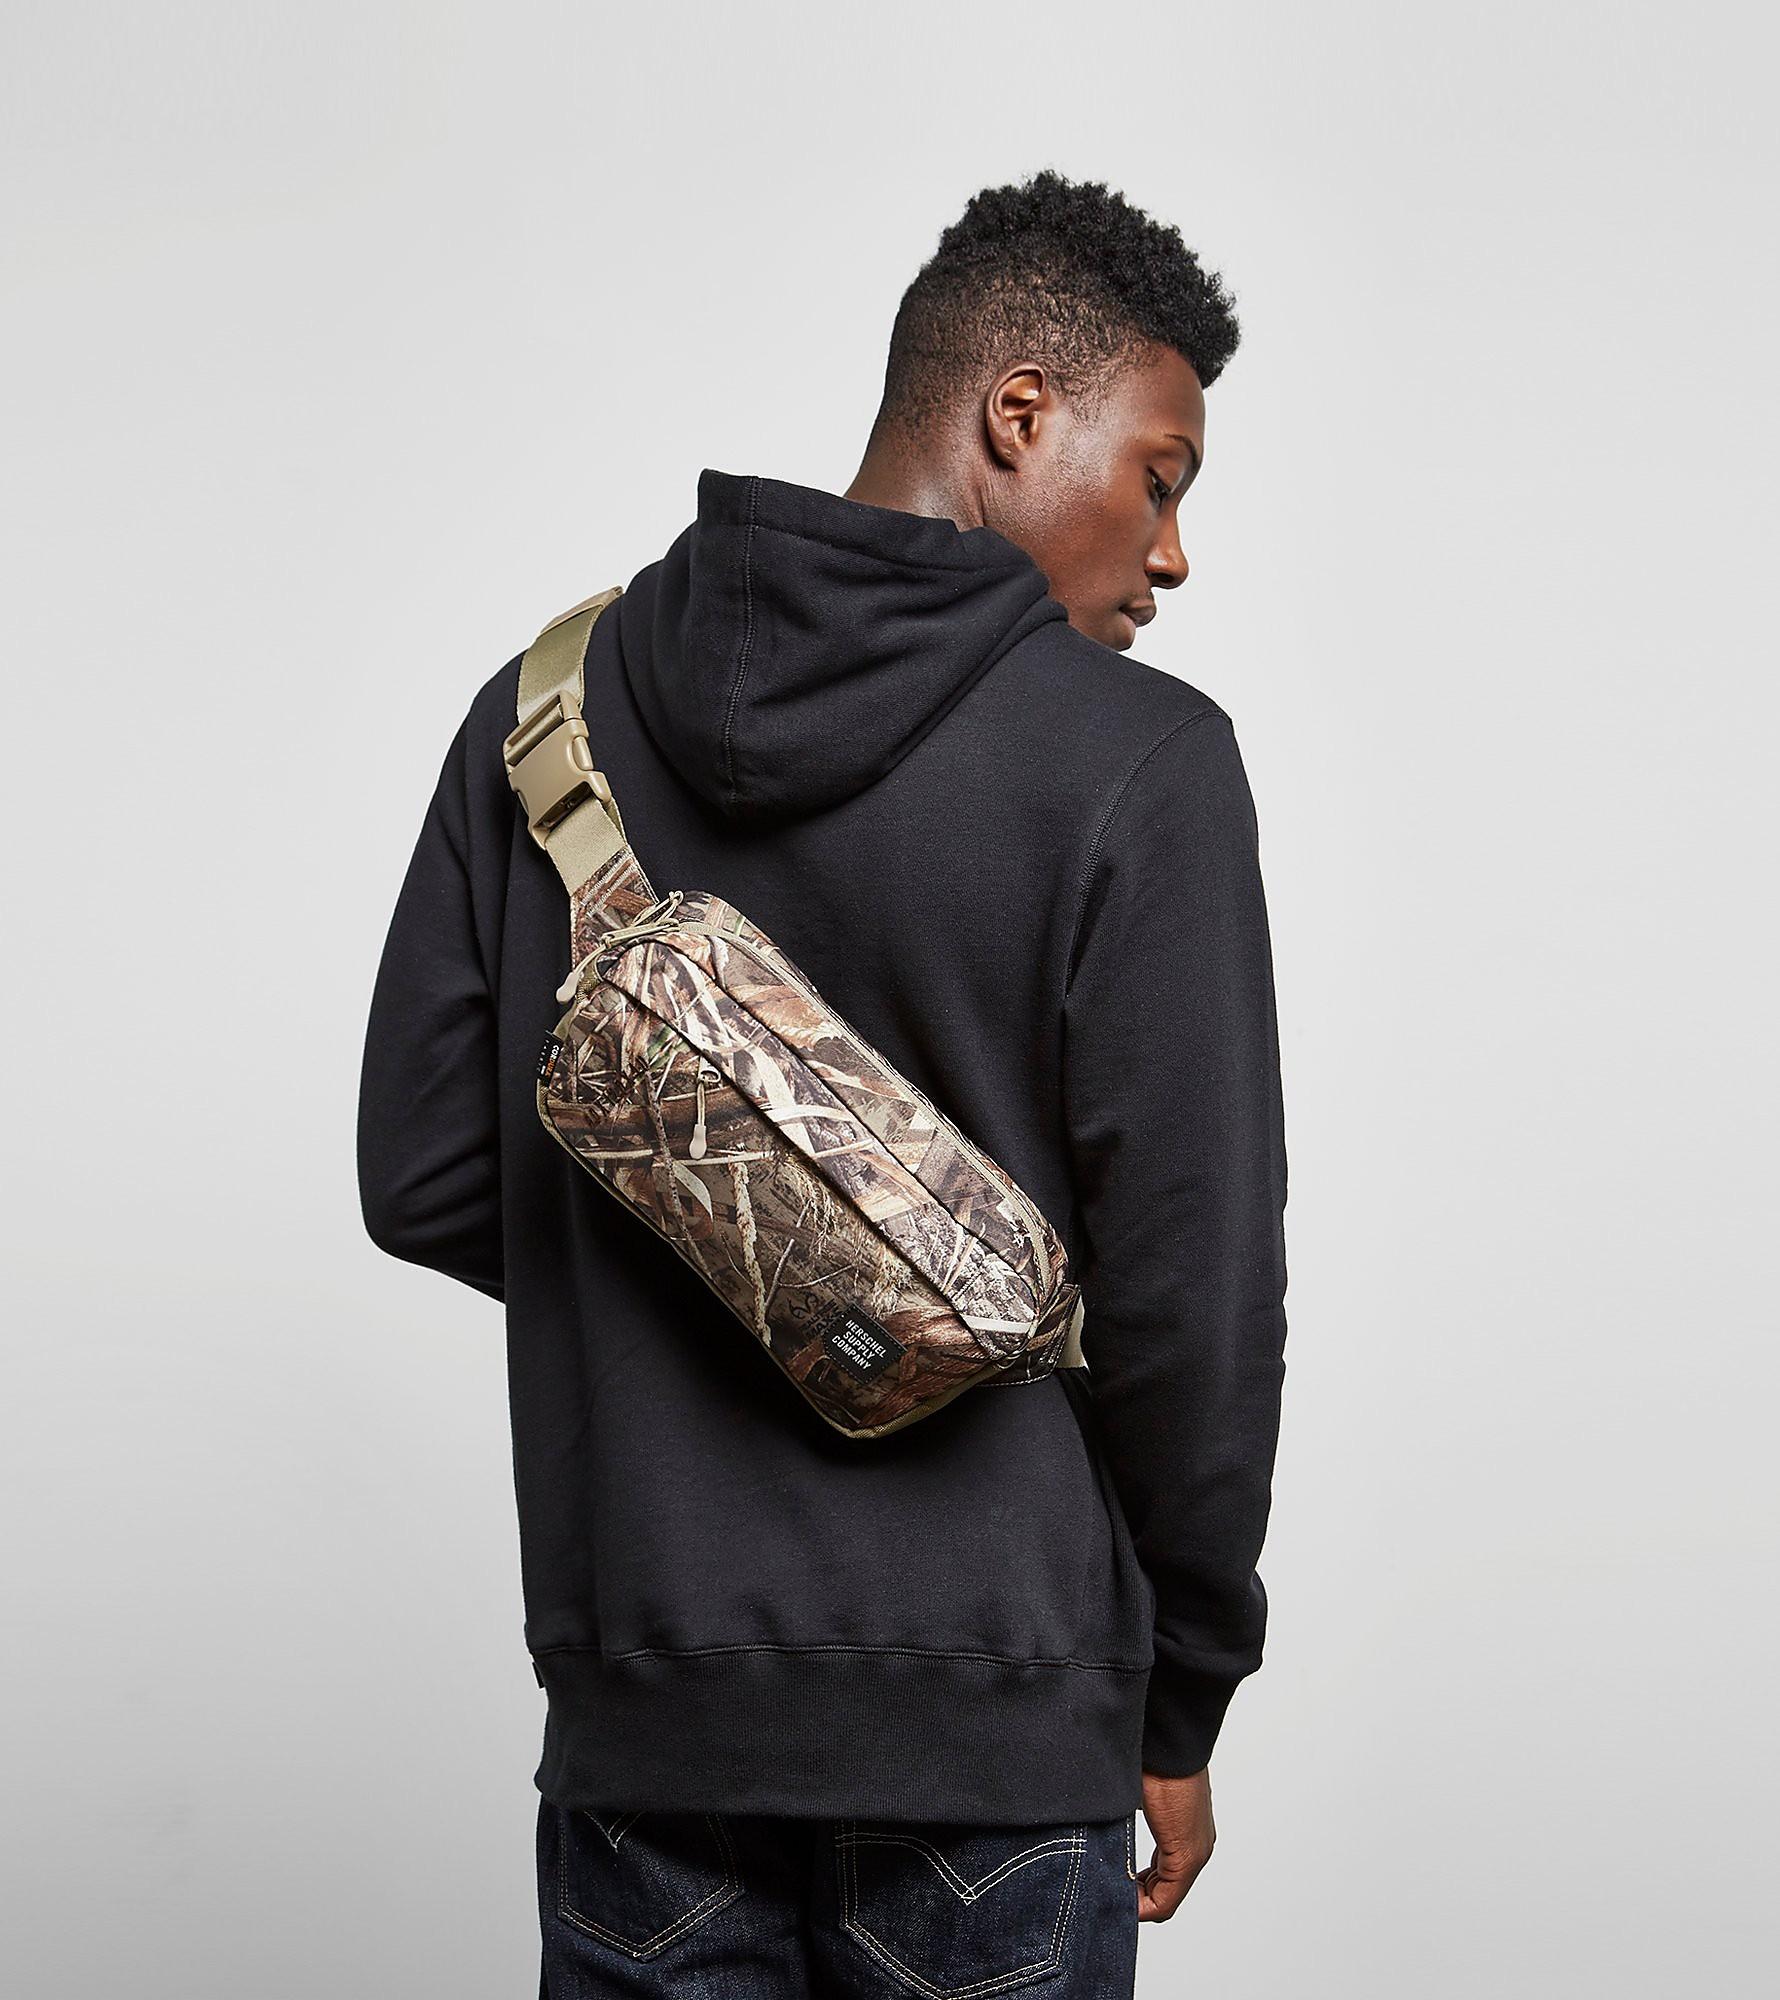 Herschel Supply Co Tour Camo Cross Body Bag